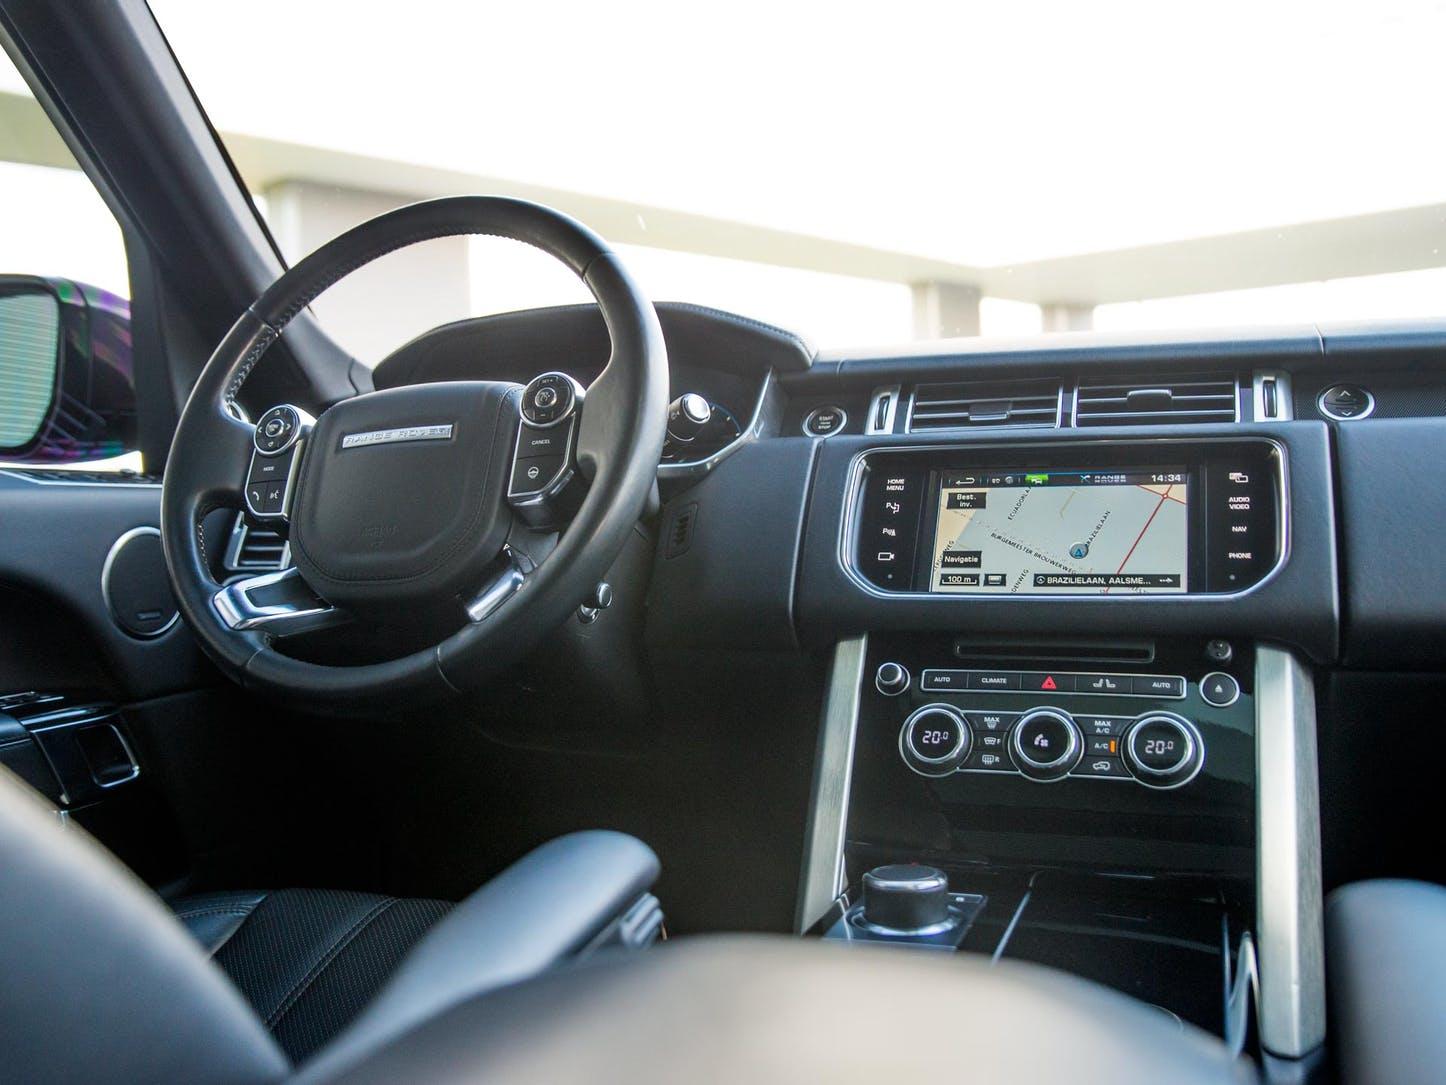 Tweedehands Range Rover 4.4 SDV8 occasion